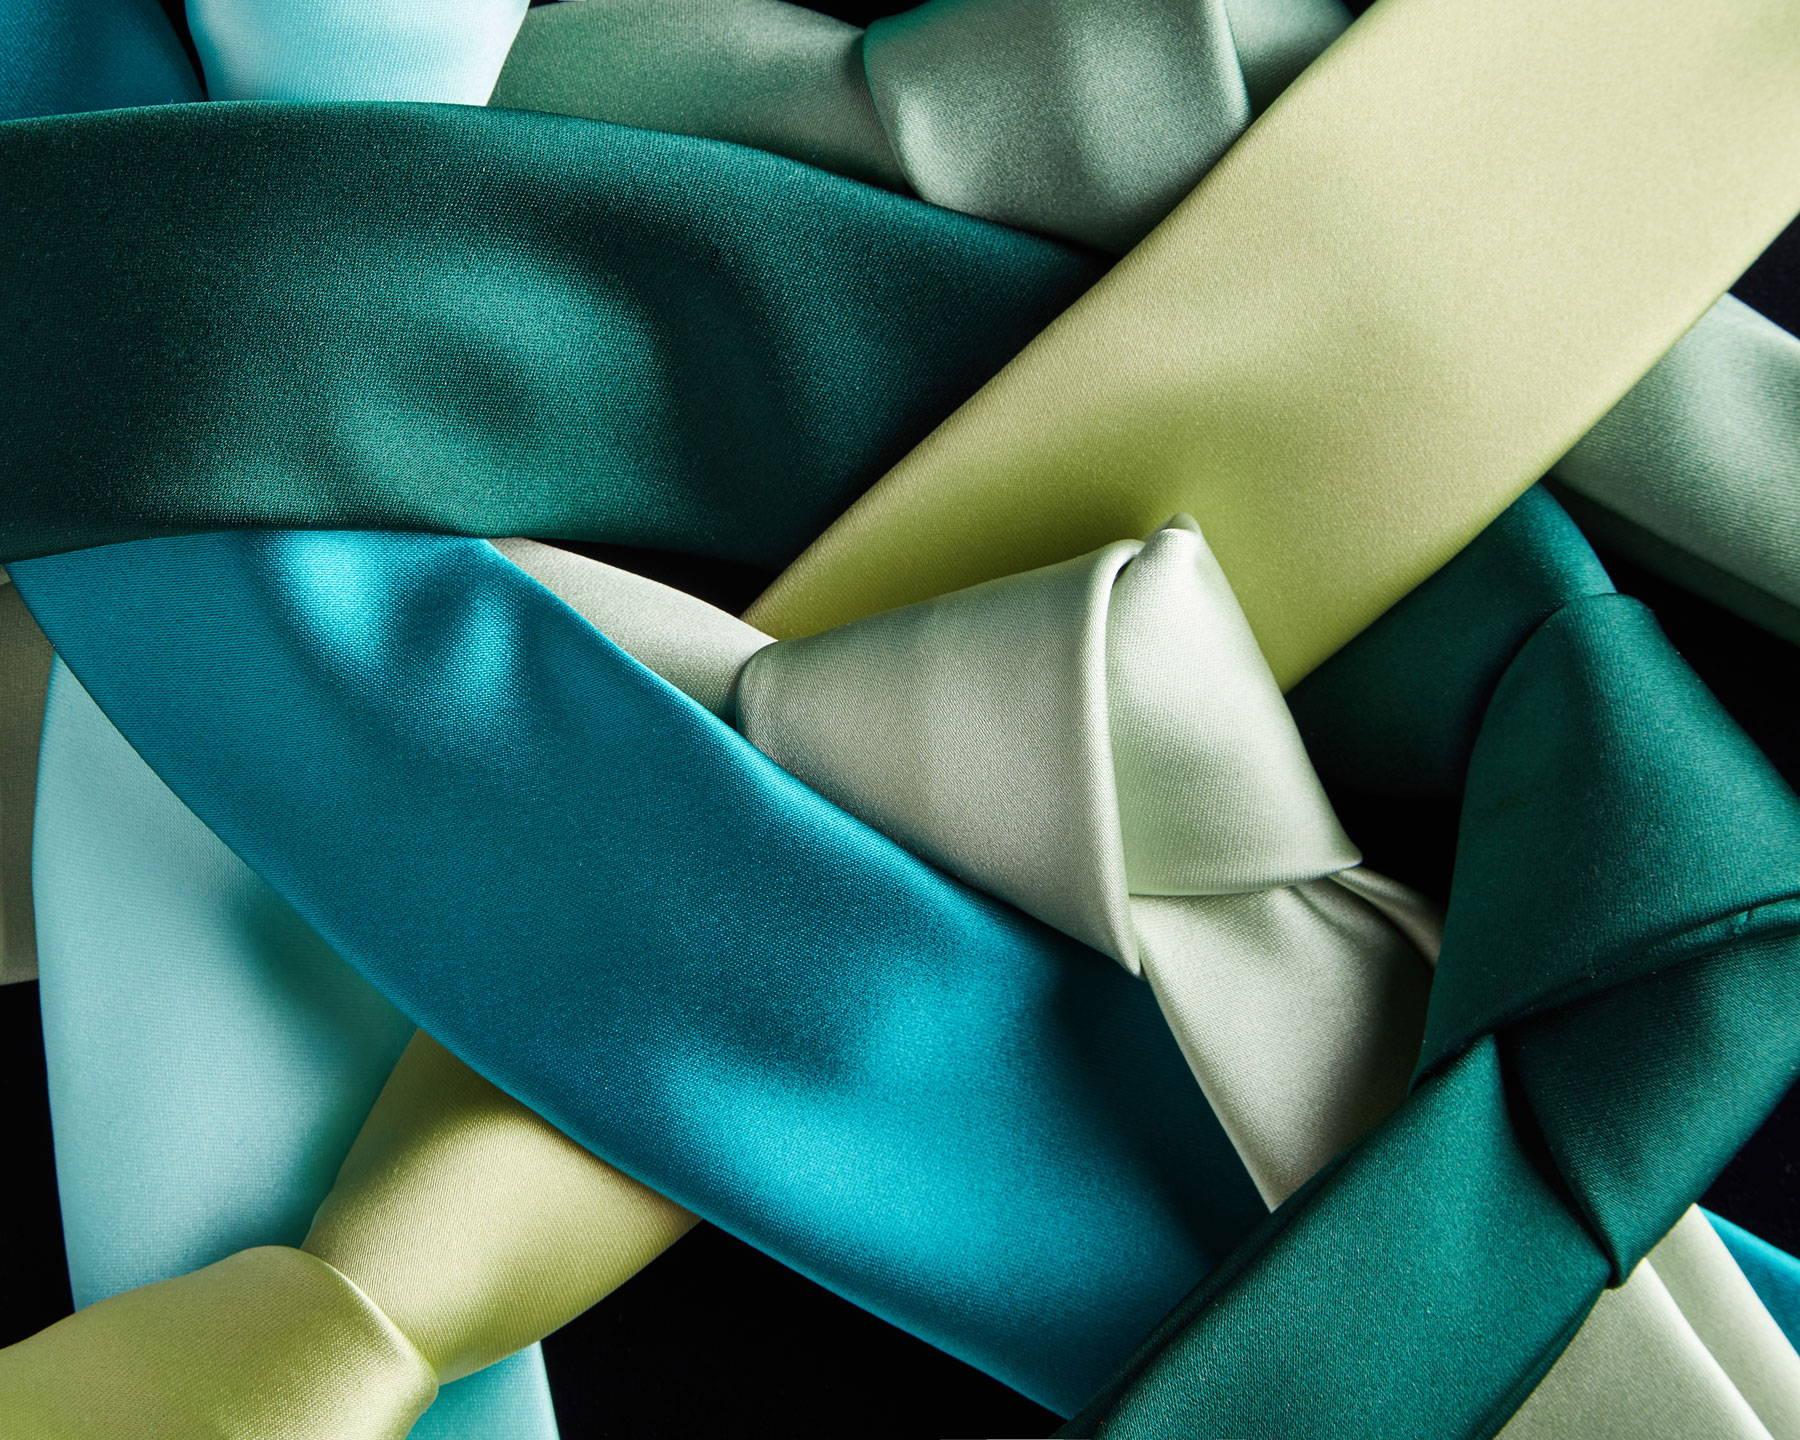 Green ties laid flat